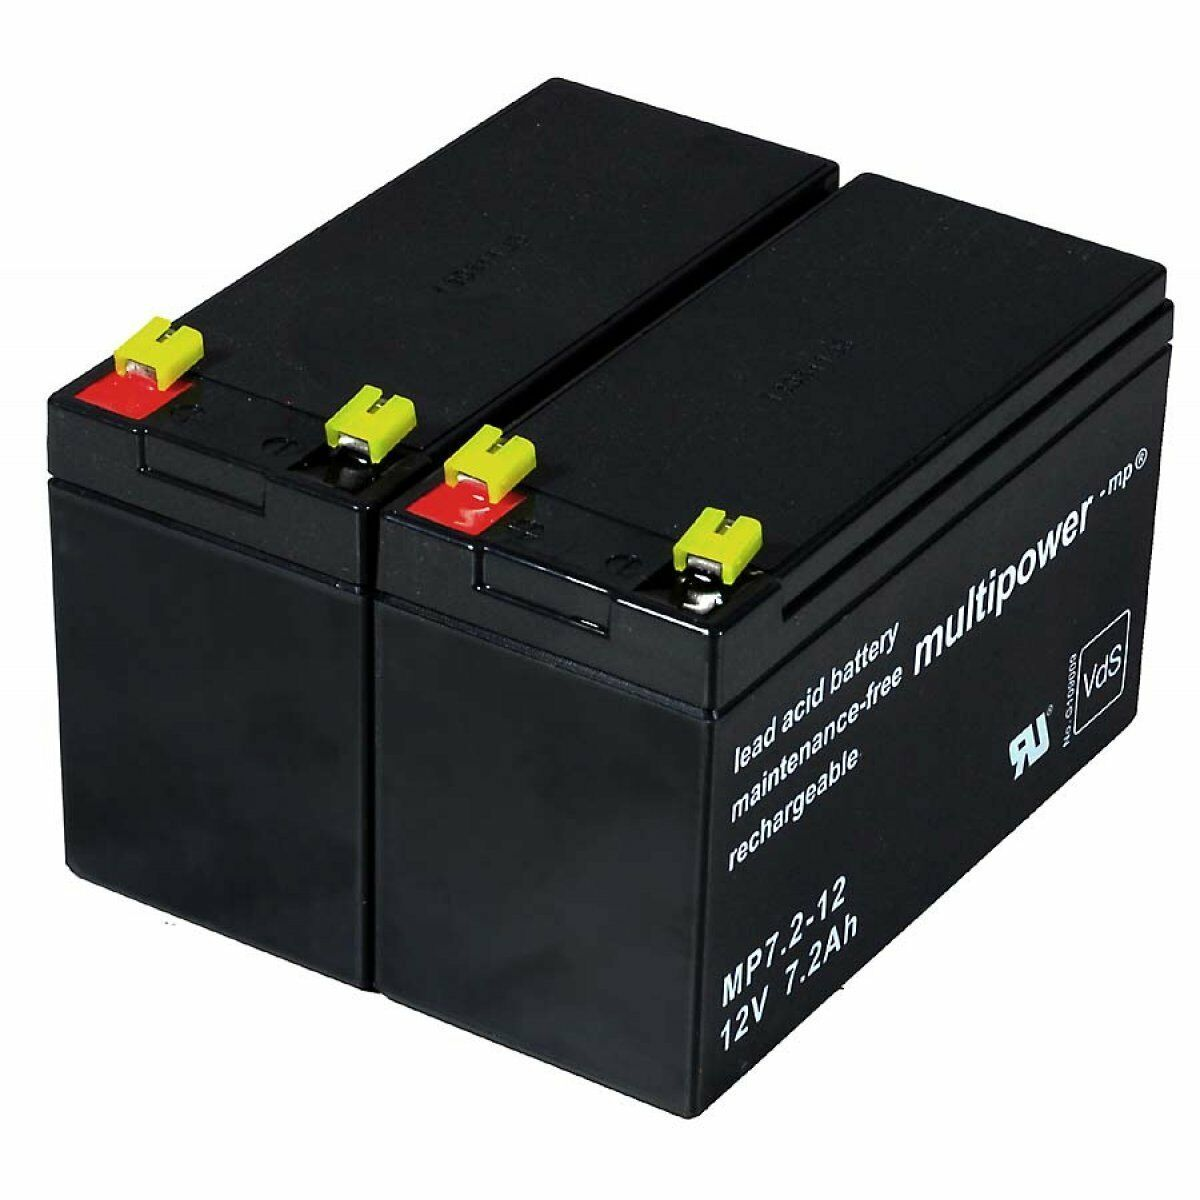 Powery Ersatzakku für USV APC RBC5 12V 7,2Ah 86Wh Lead-Acid Schwarz | Feinbearbeitung